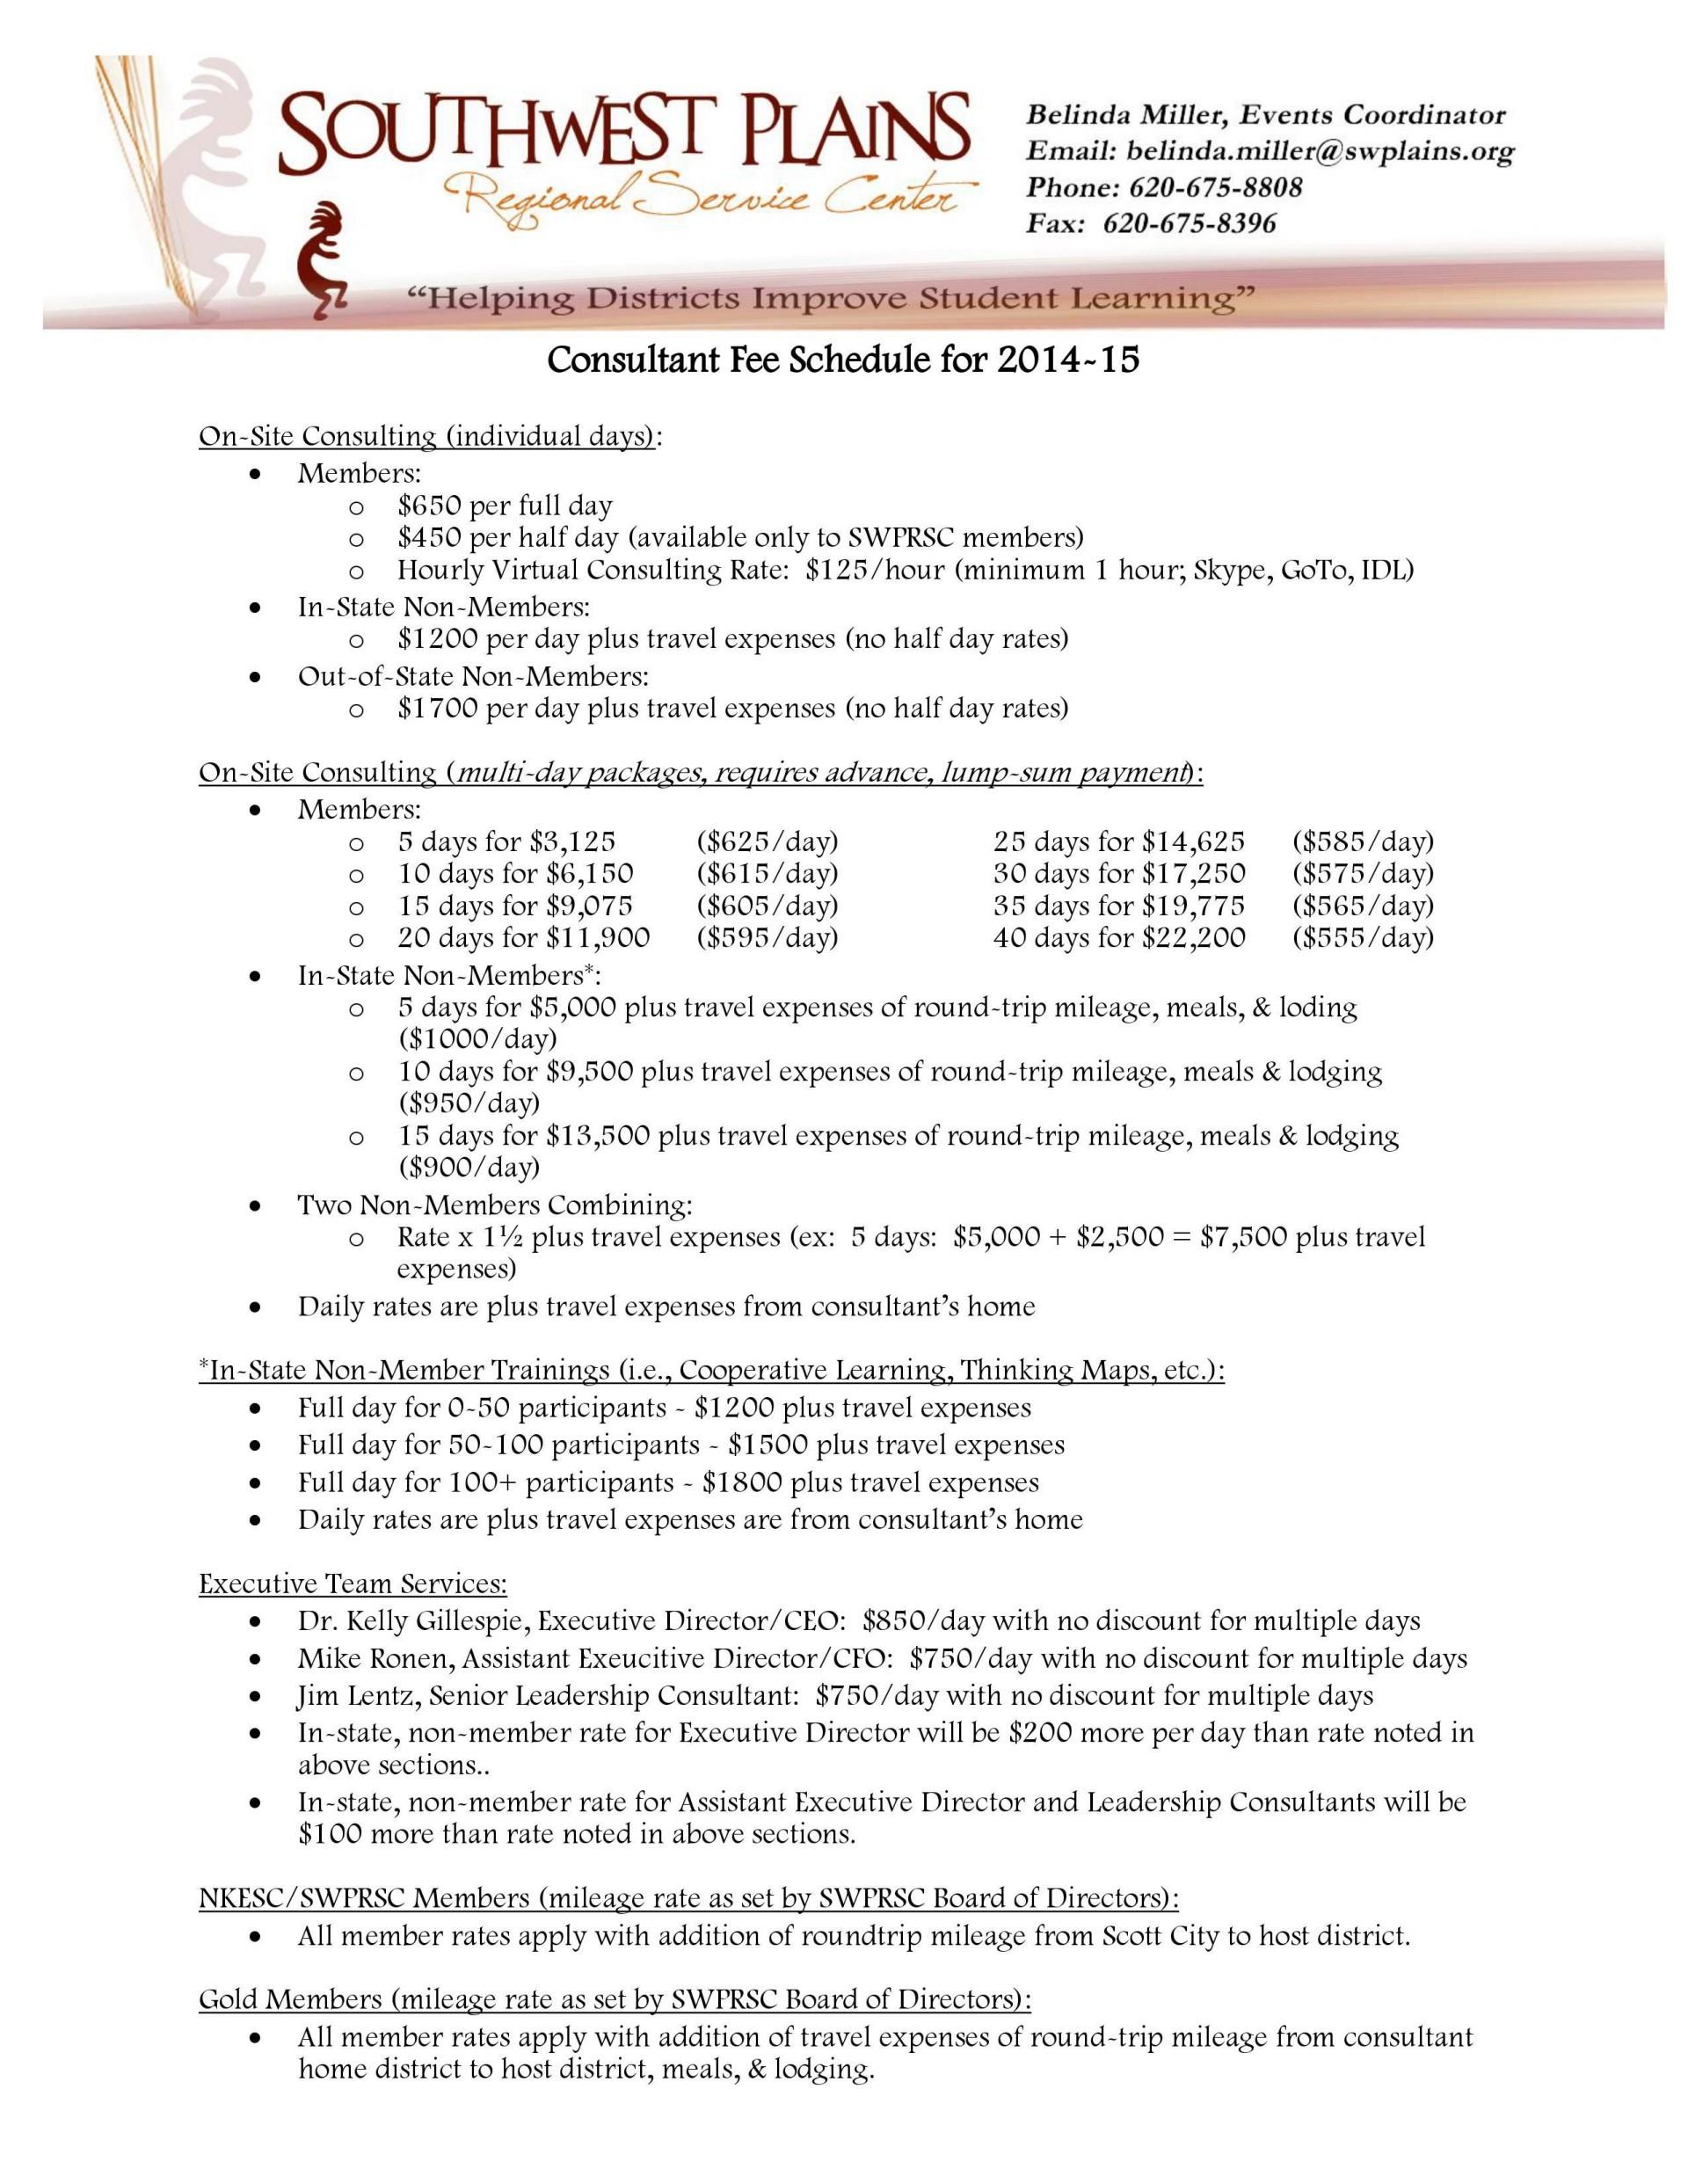 002 Phenomenal Consultant Fee Schedule Template Design 1920